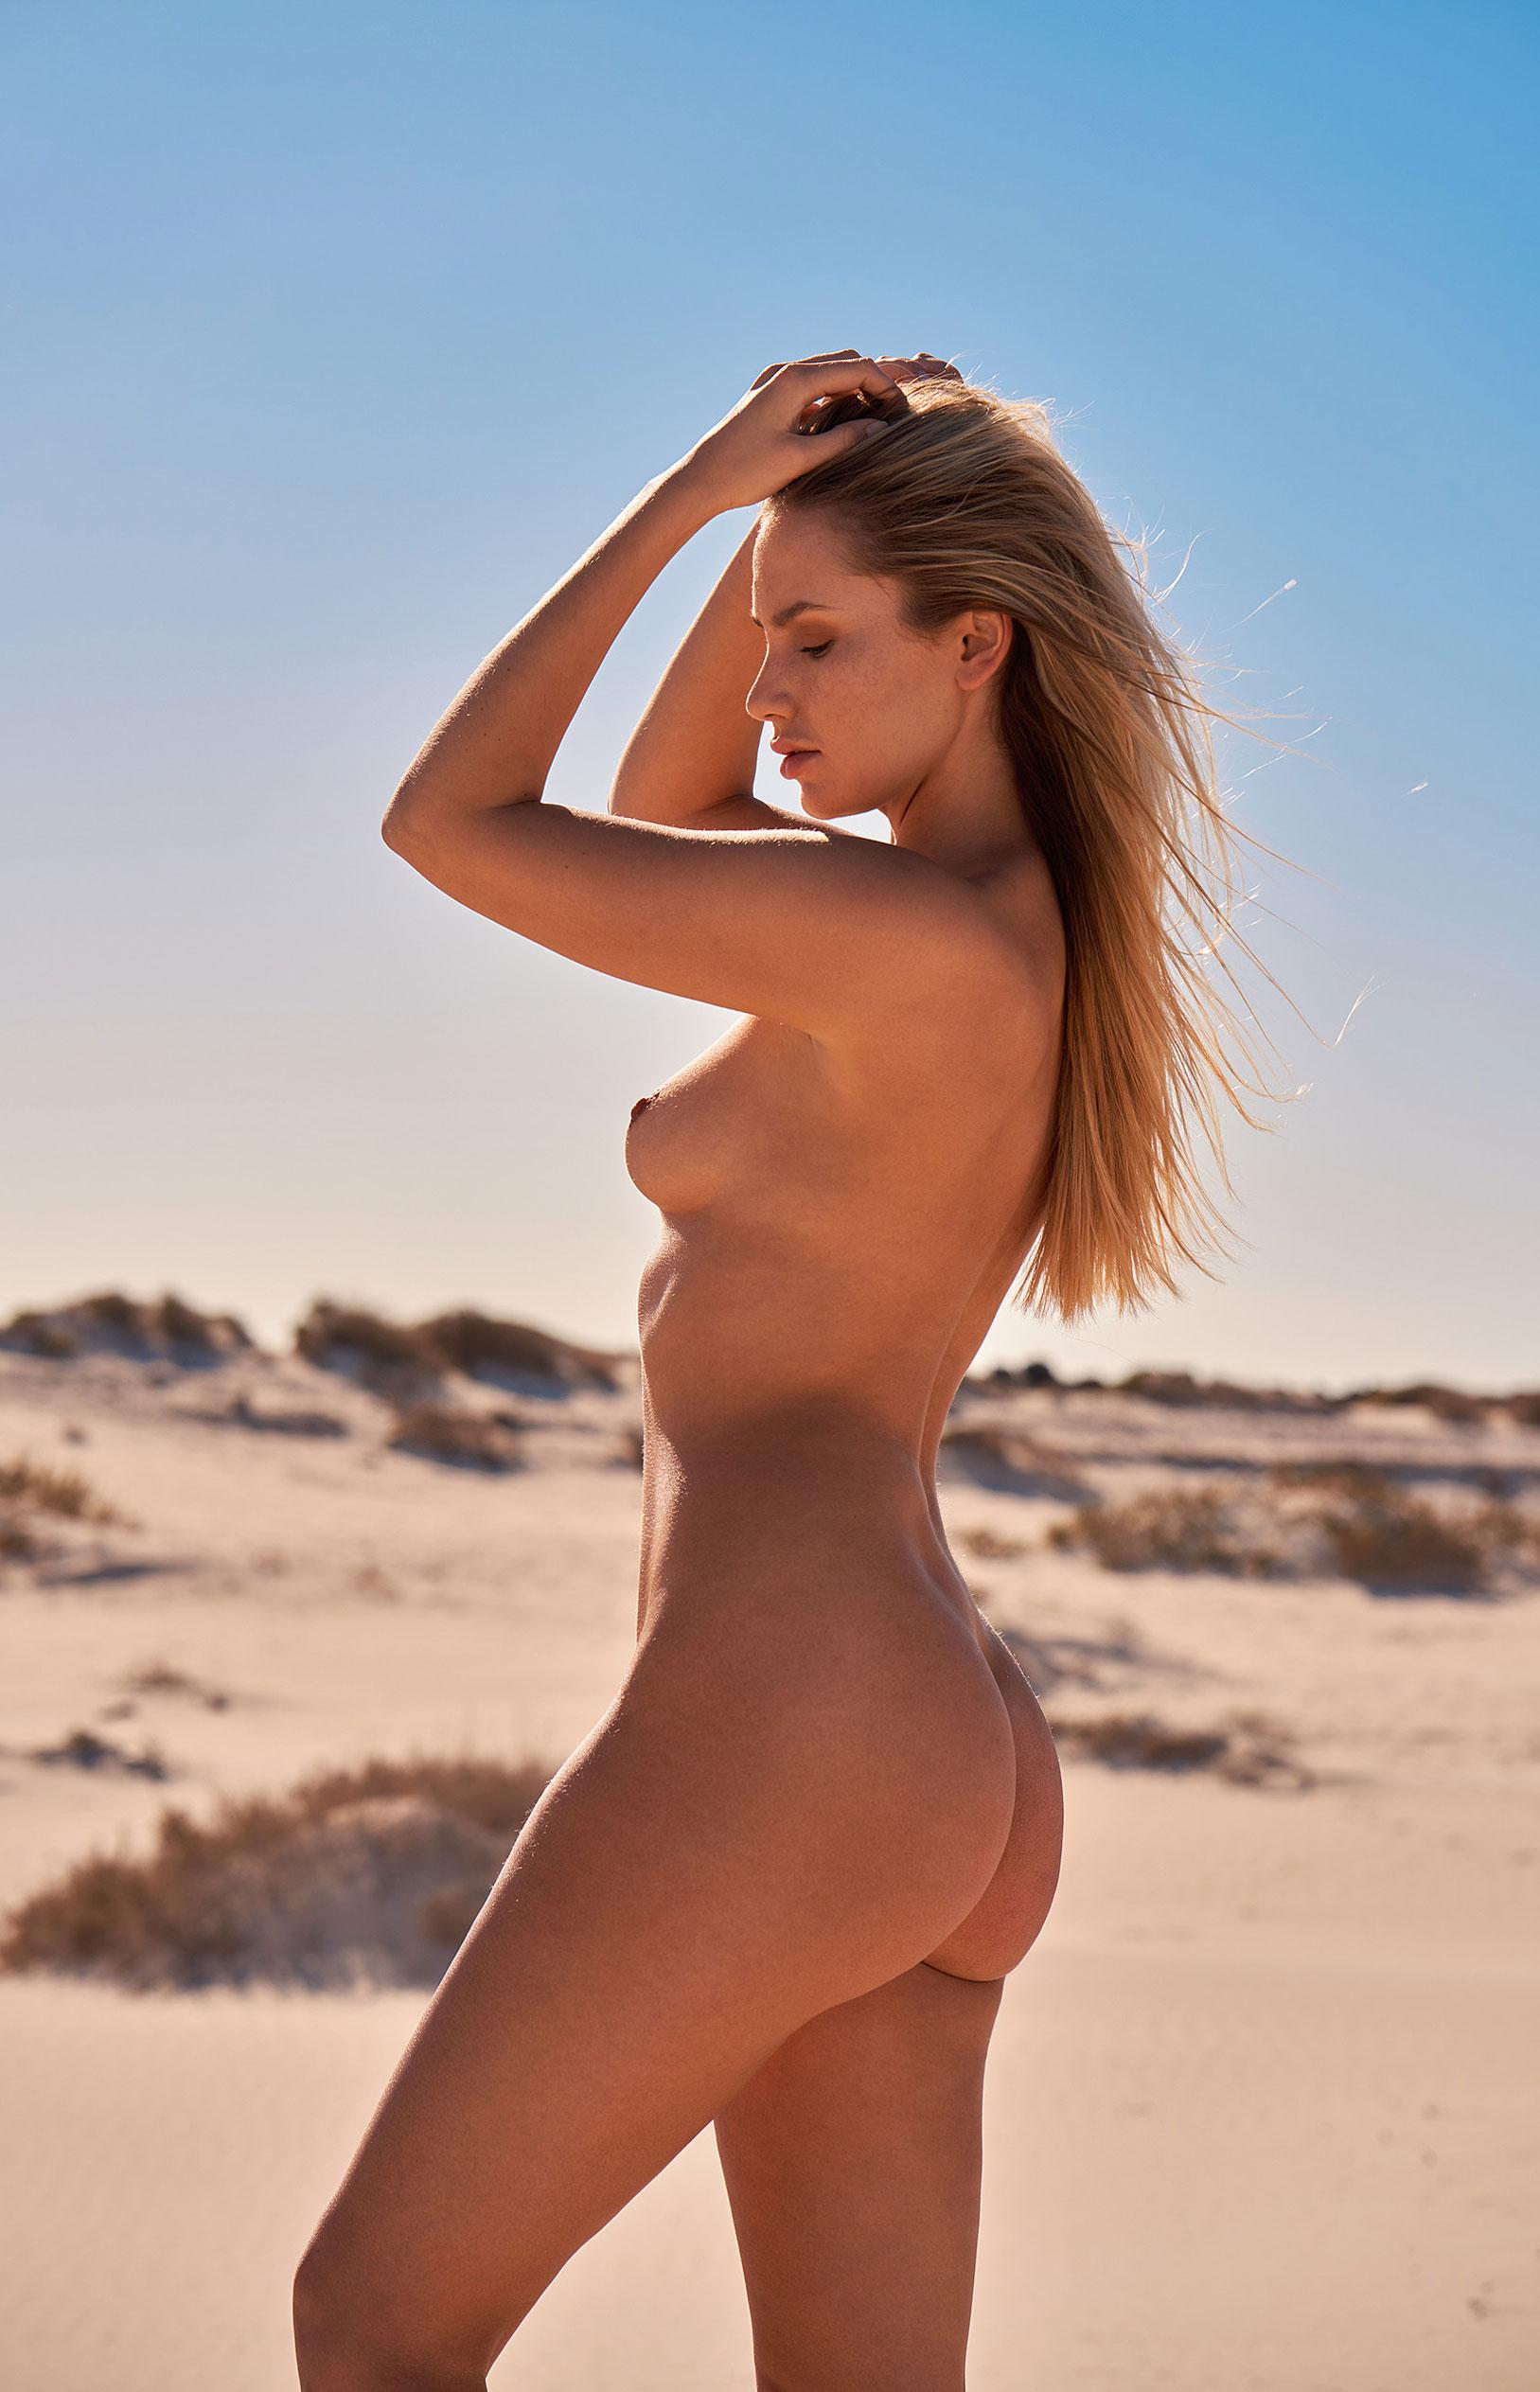 Jessica Witmann - Simon Bolz (Playboy) photoshoot